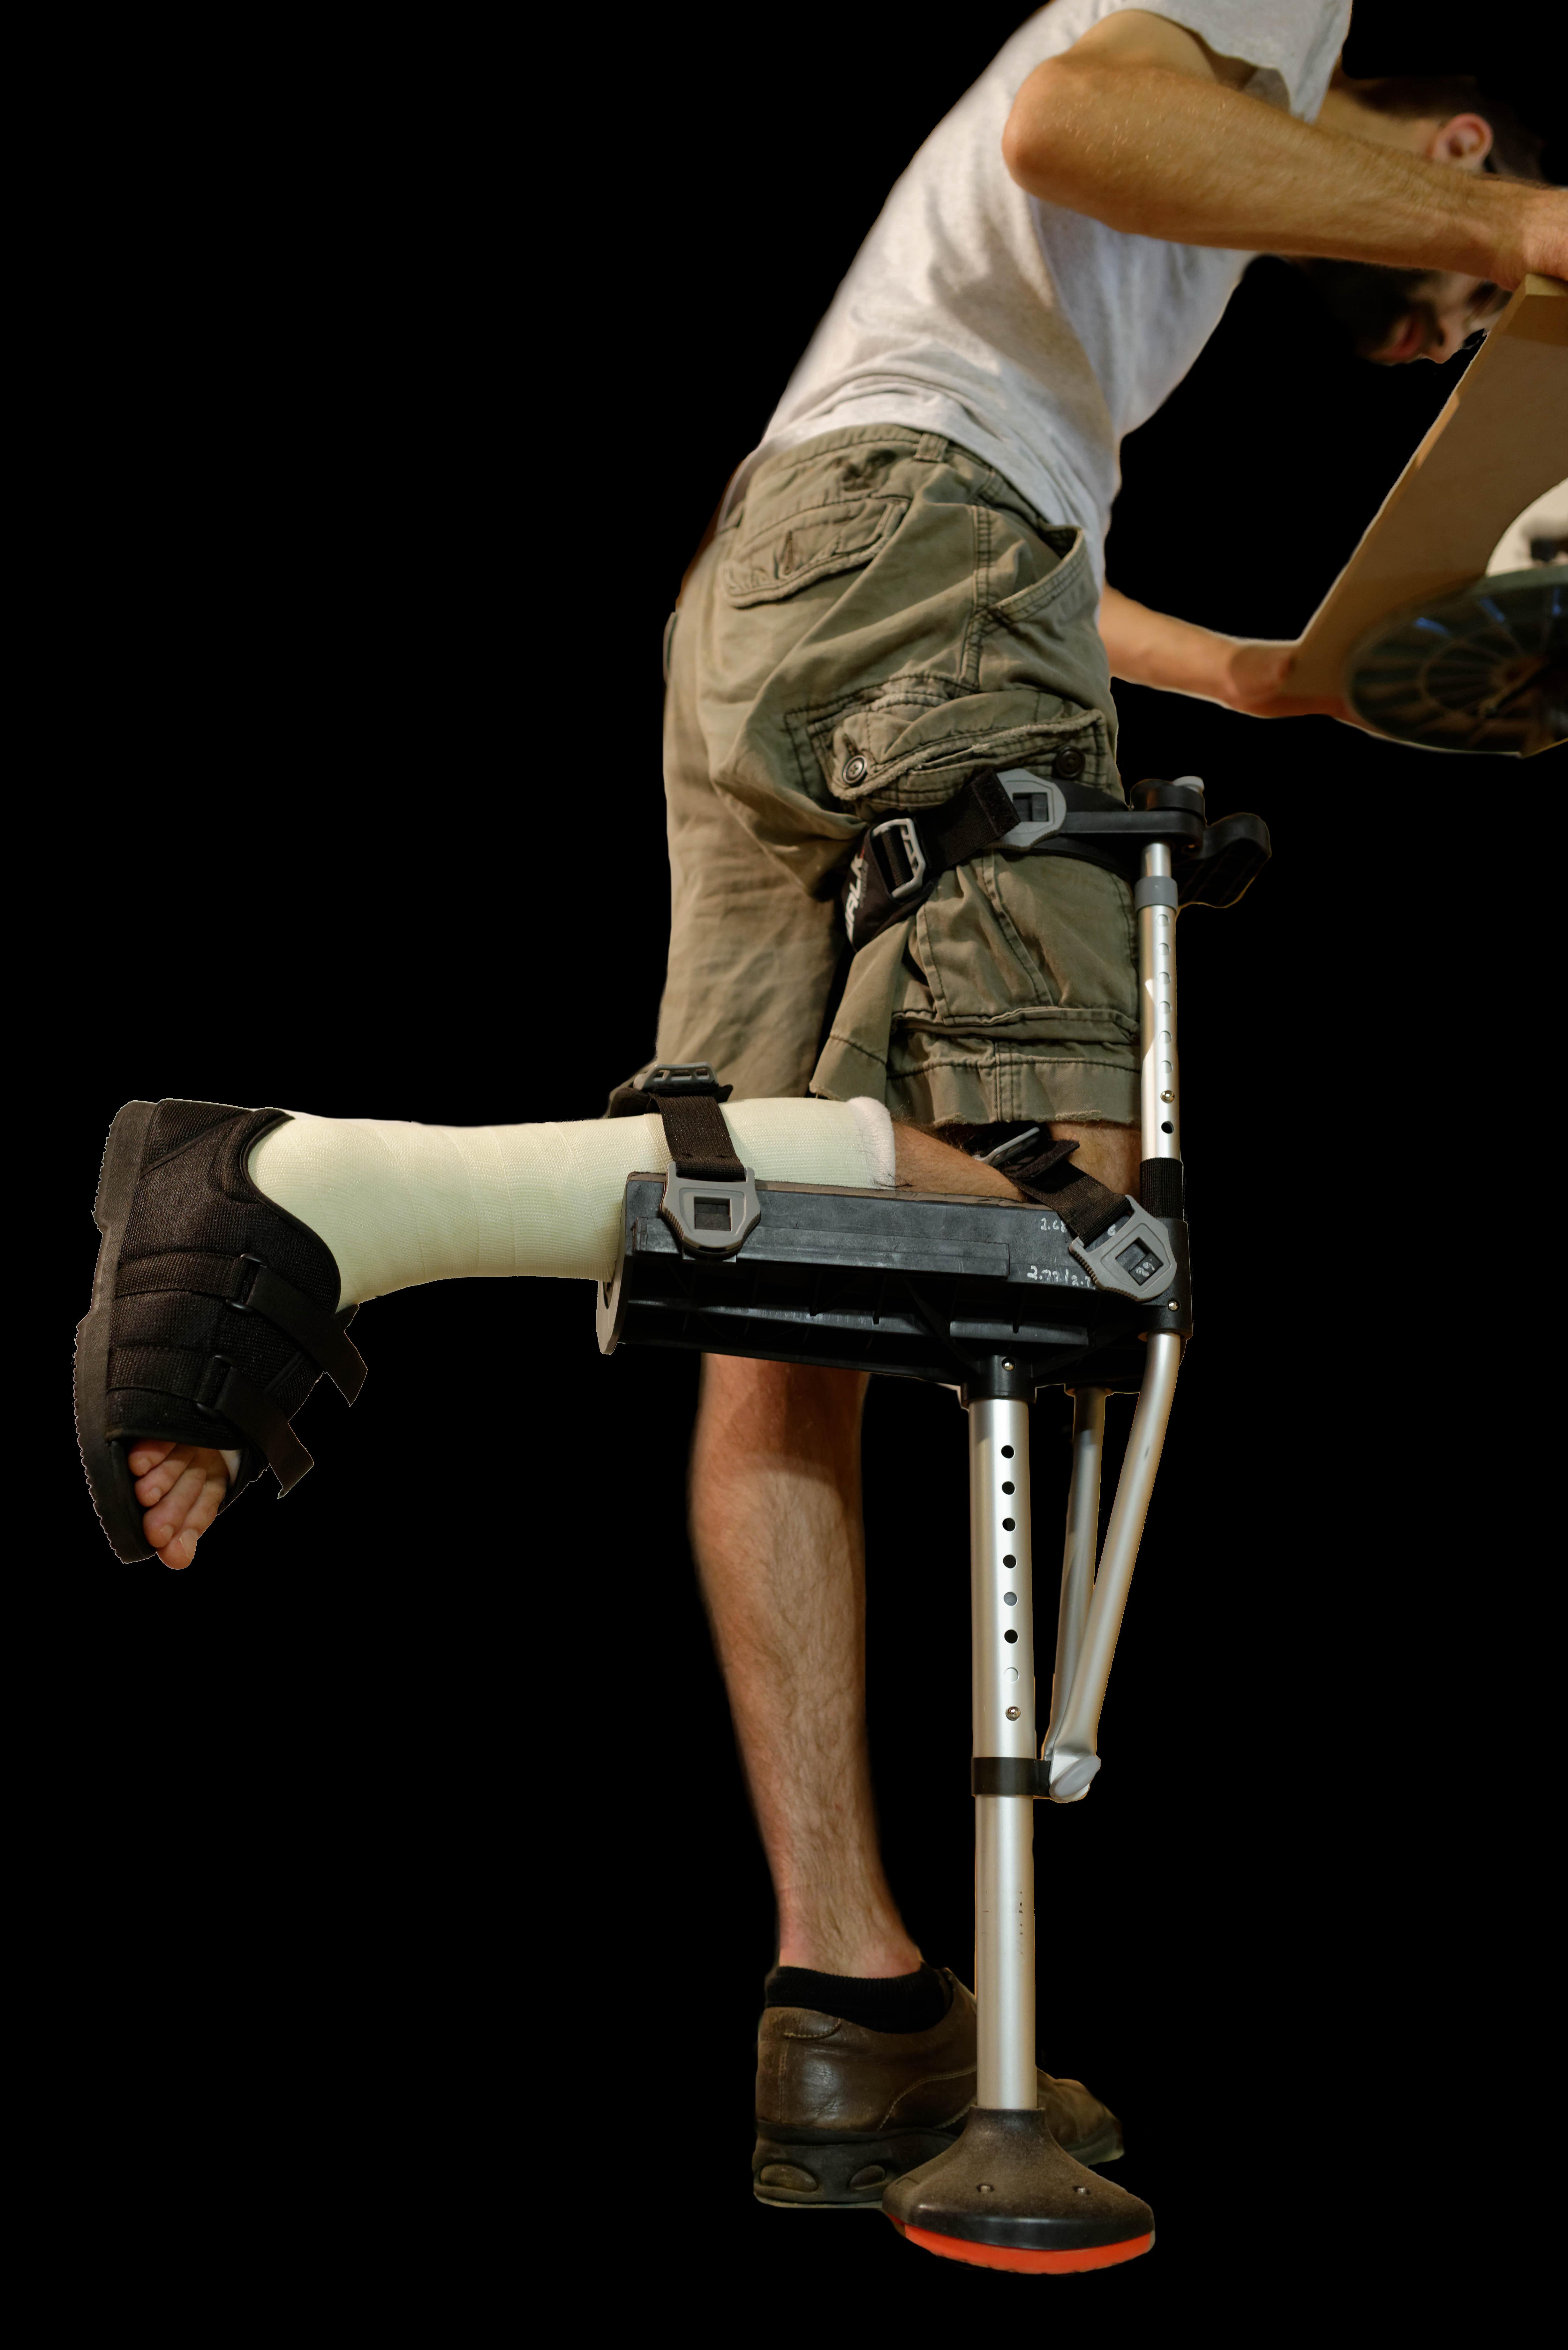 Throw crutches and walk